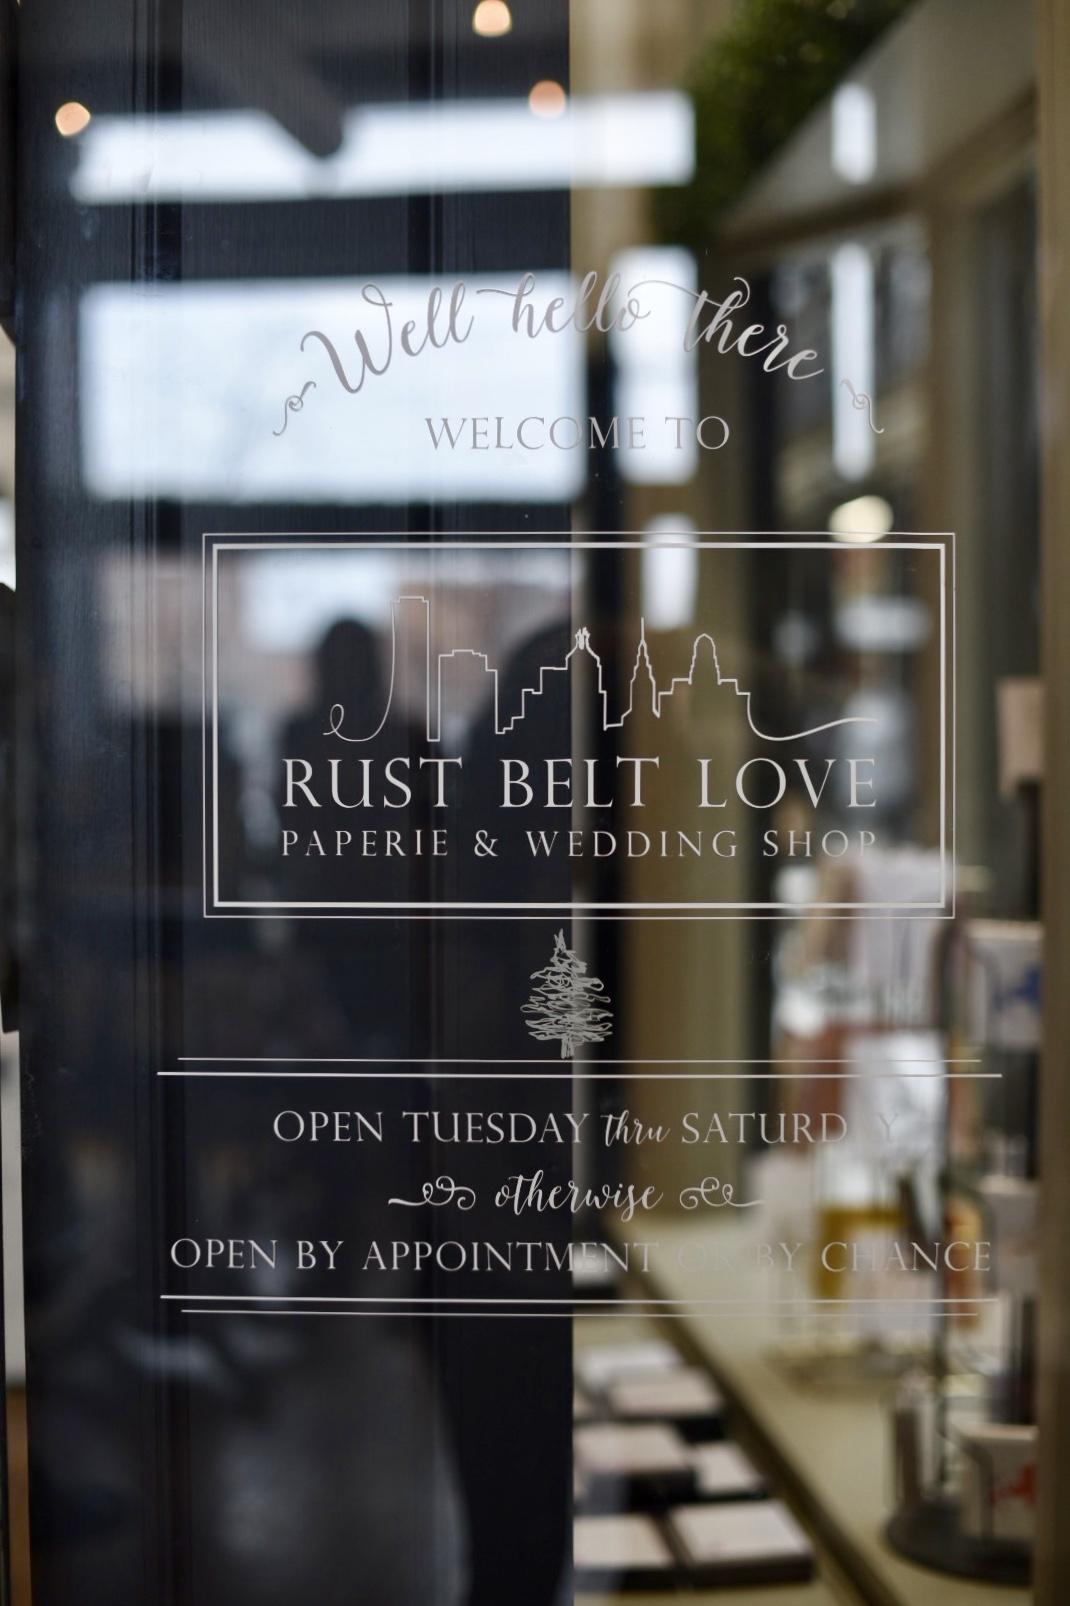 RustBeltLoveStore